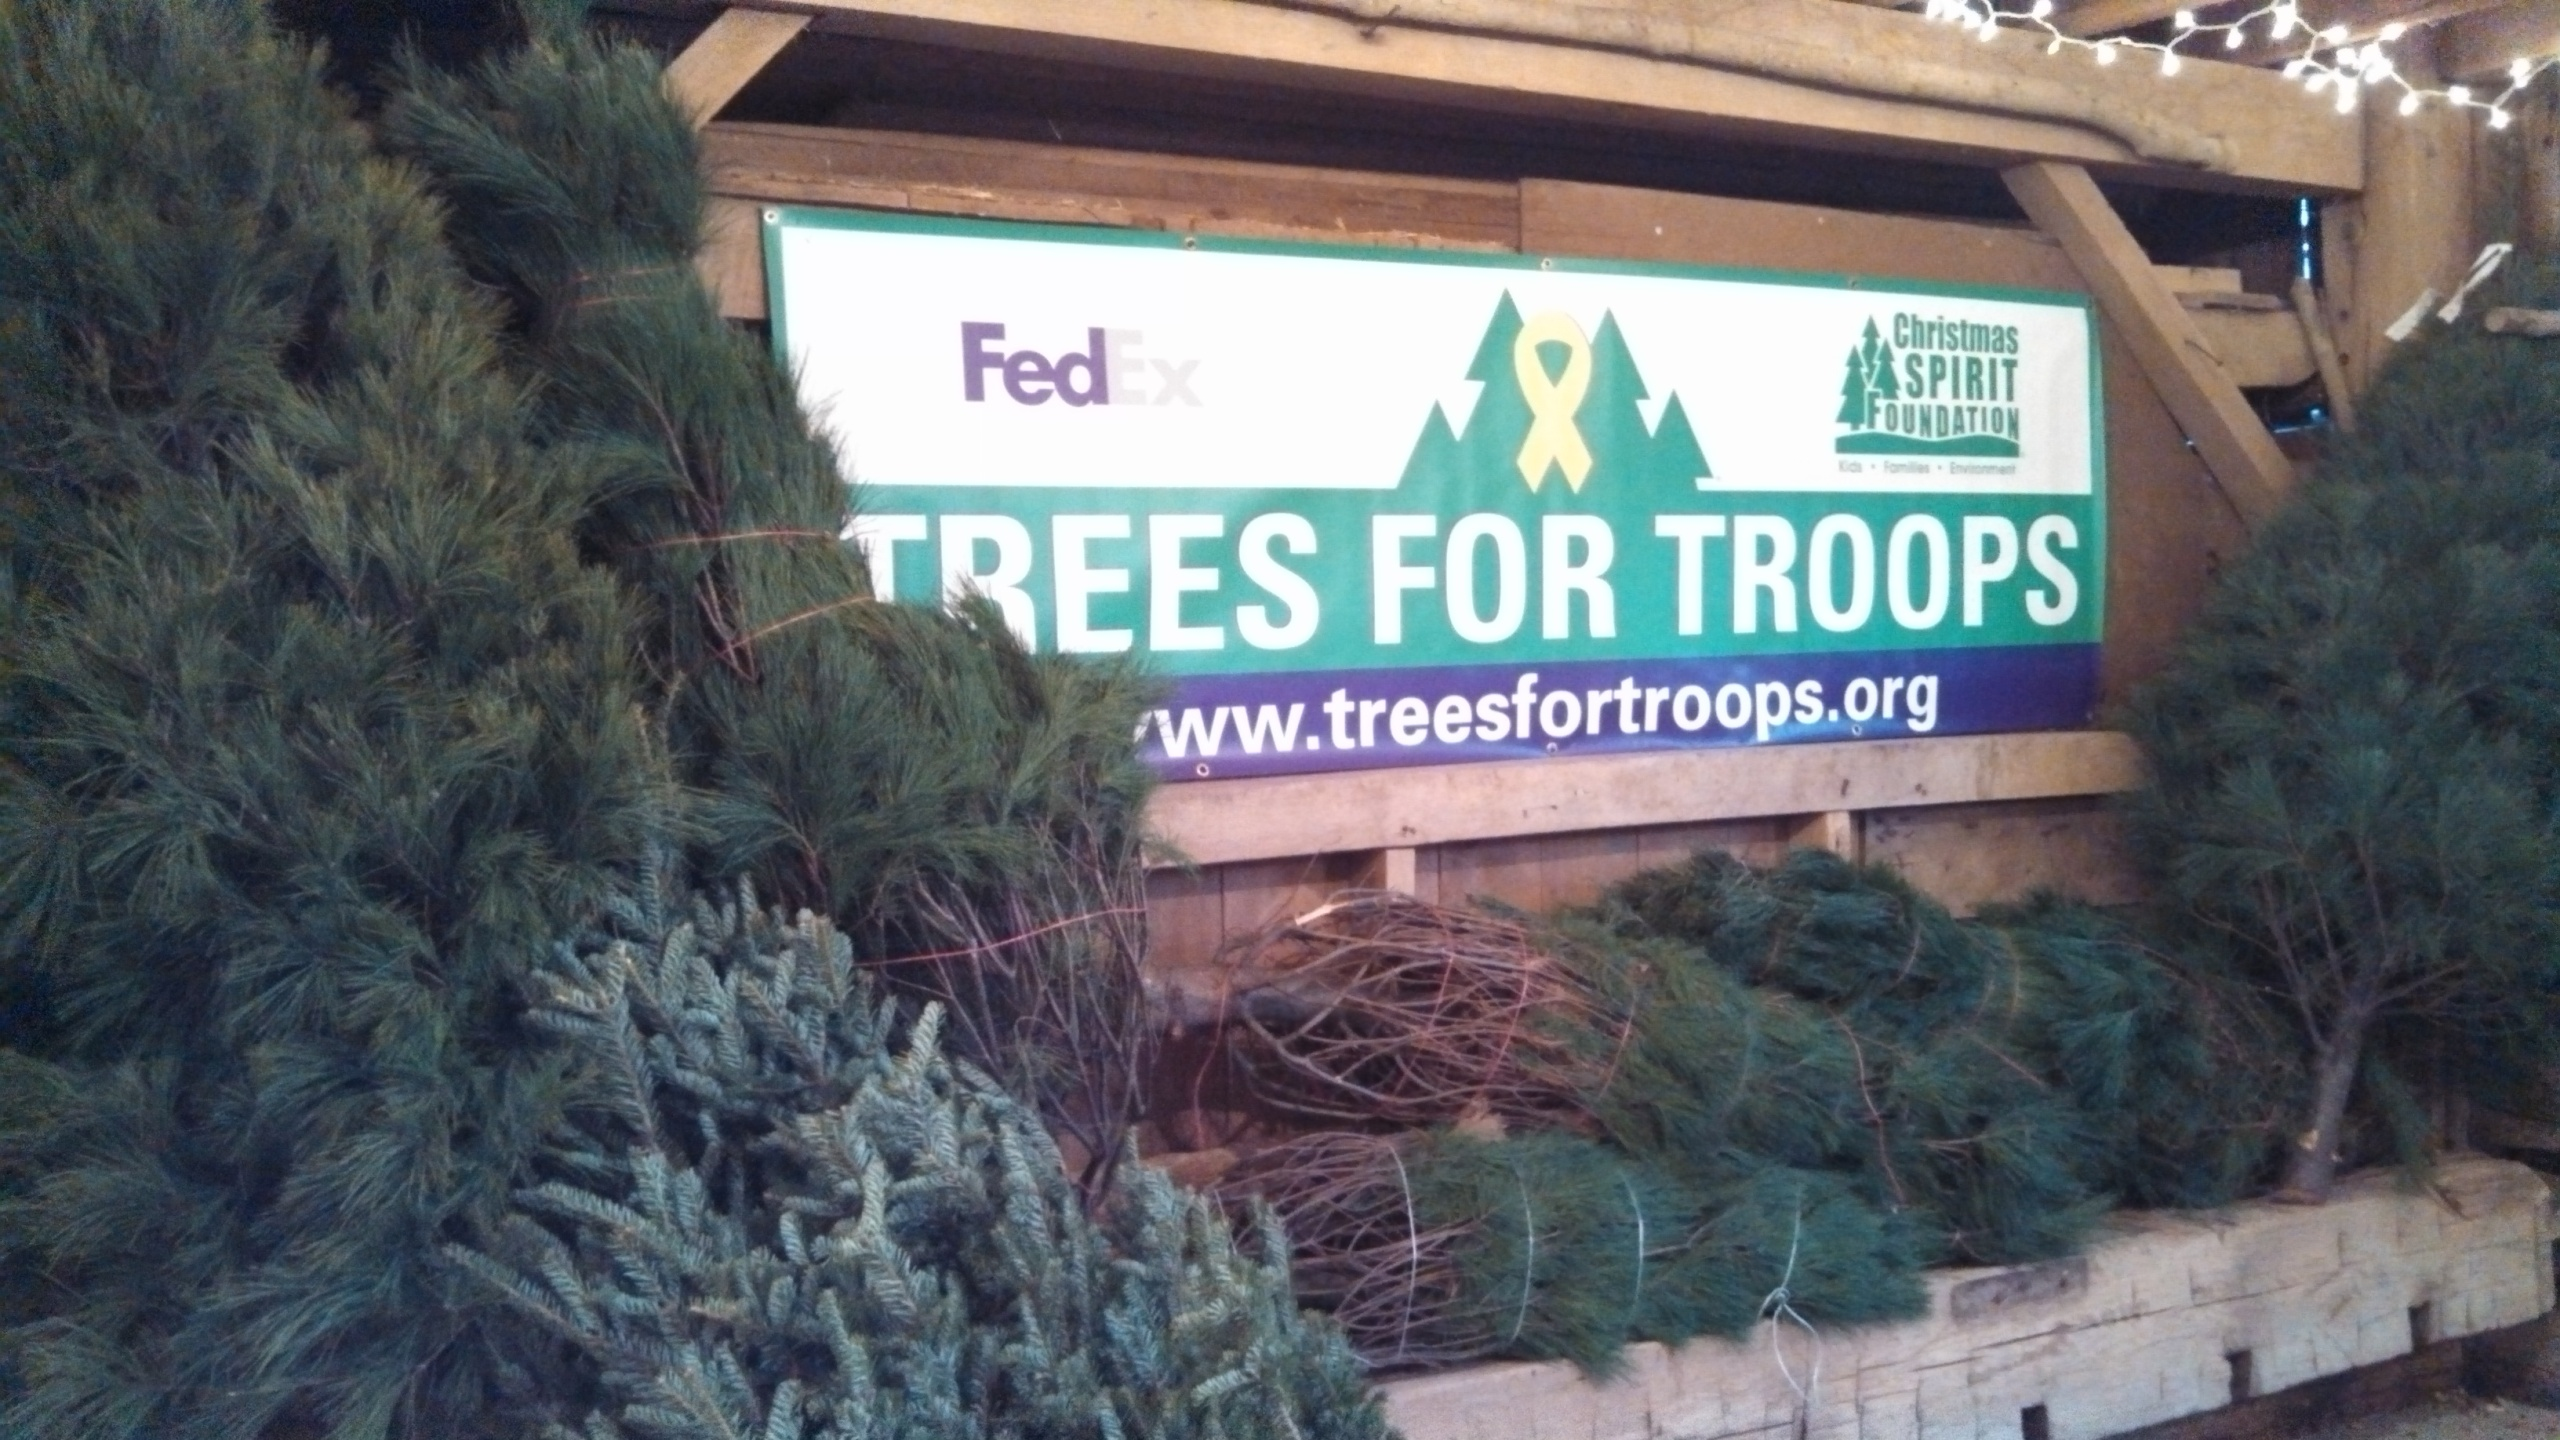 treesfortroops